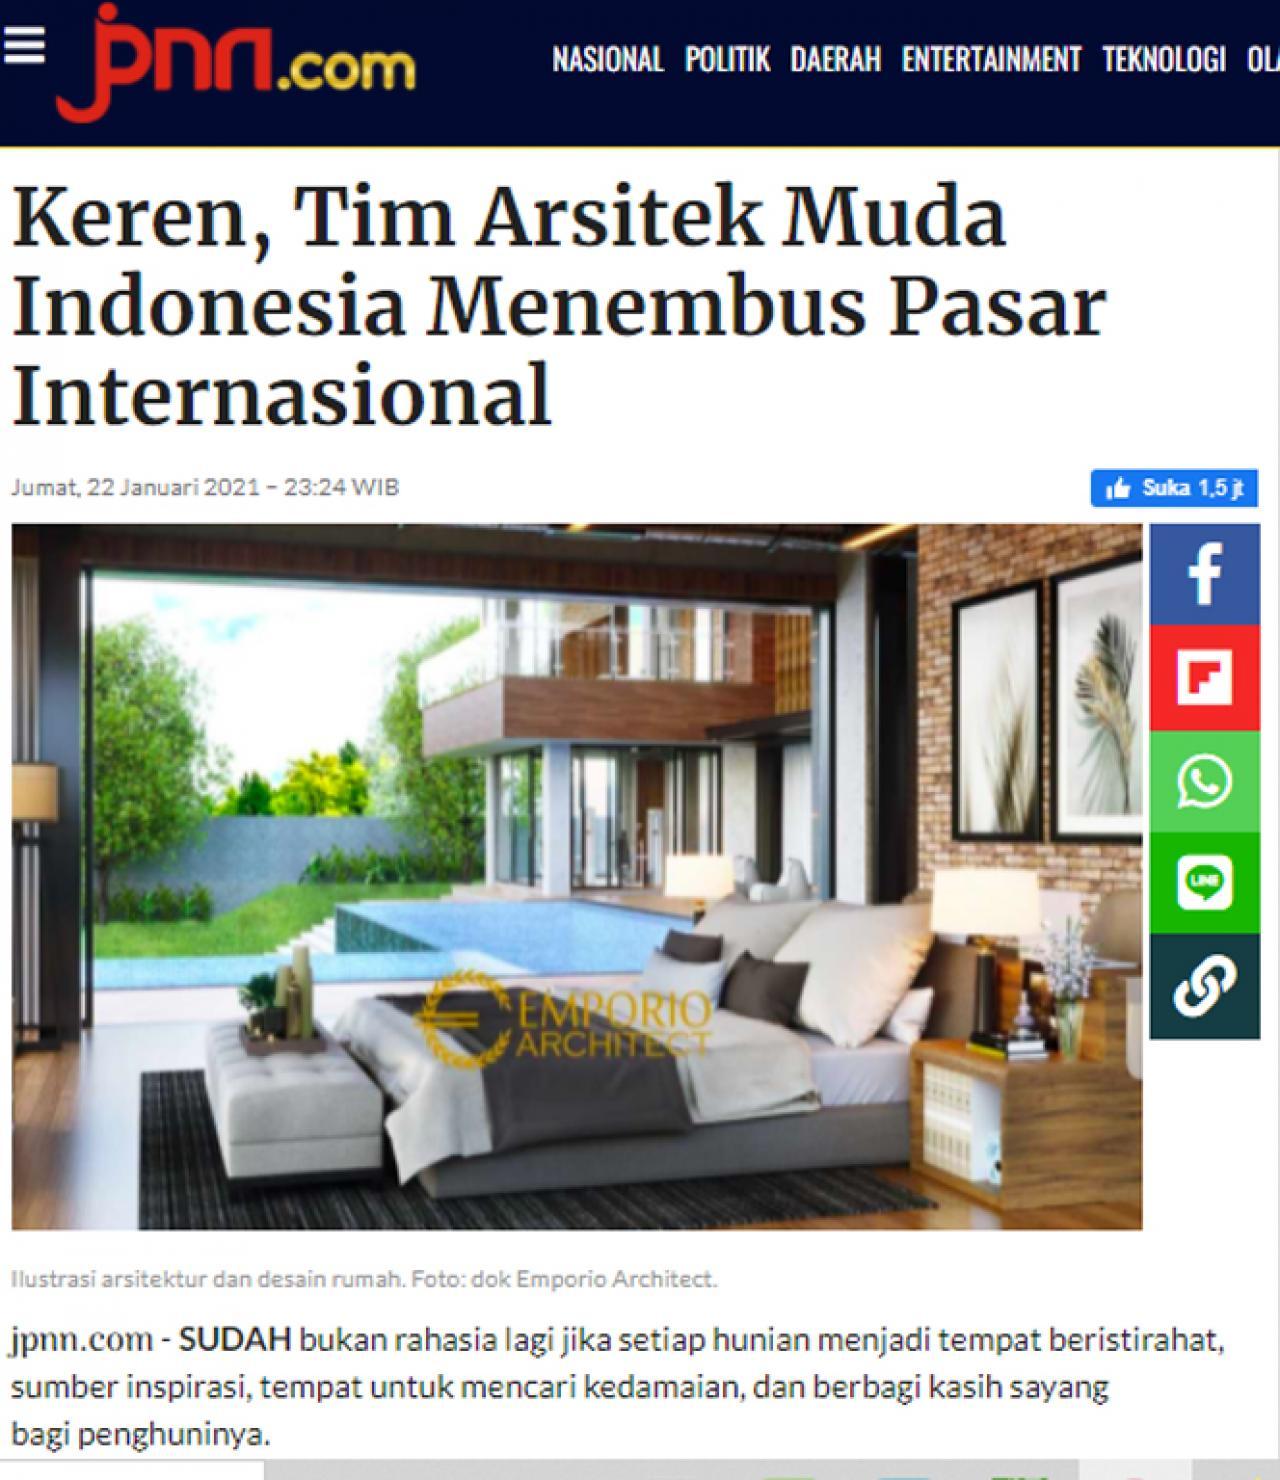 Ulasan Media jpnn.com - Keren, Tim Arsitek Muda Indonesia Menembus Pasar Internasional